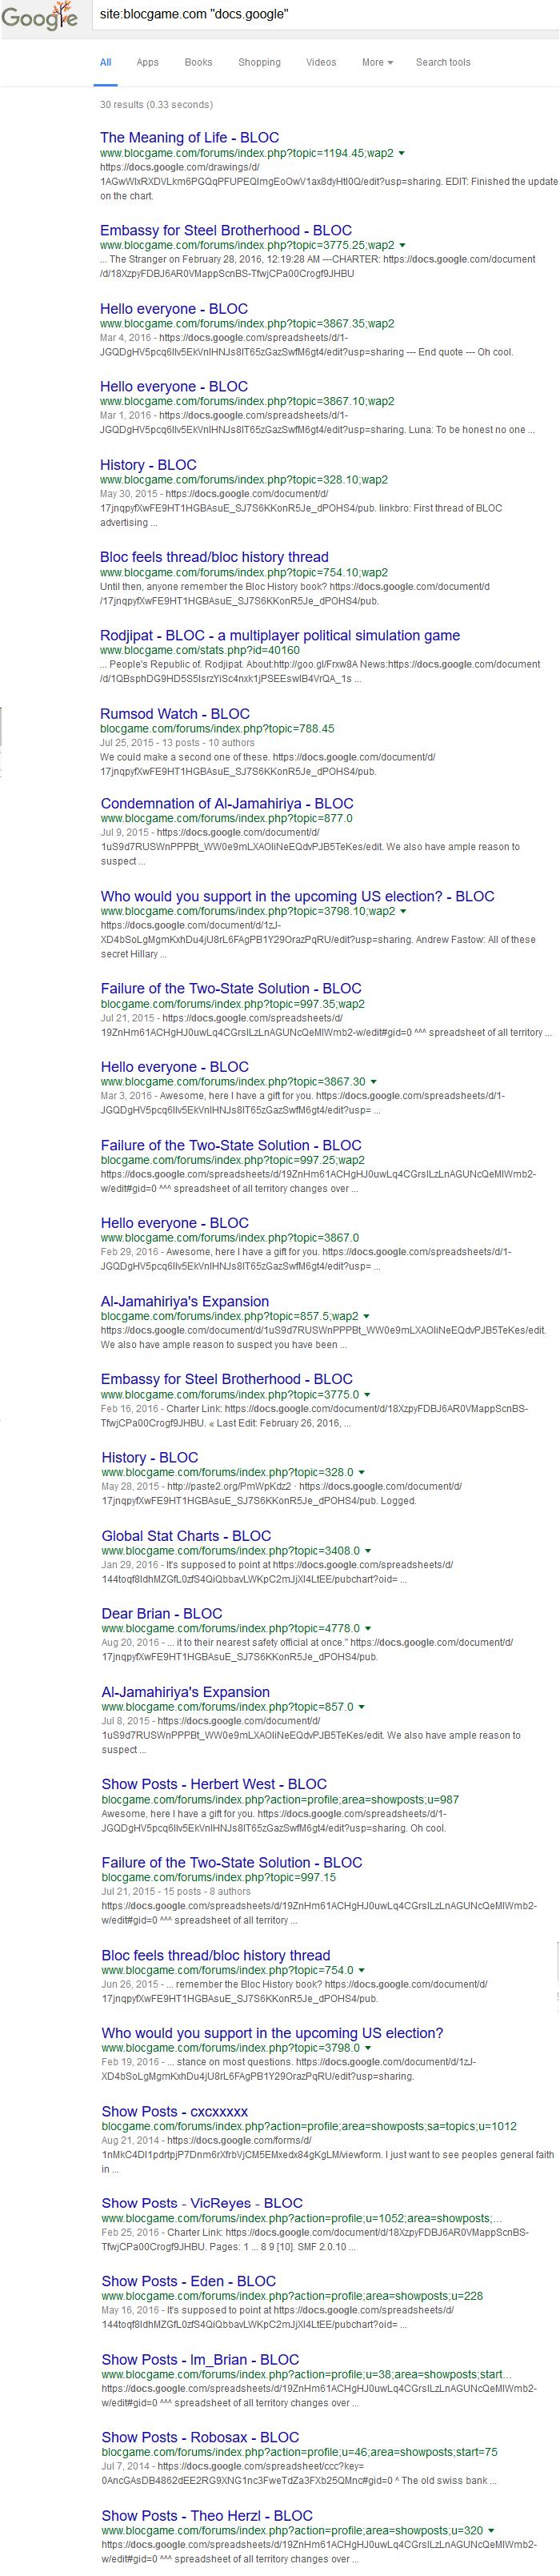 Blocgame docs.google